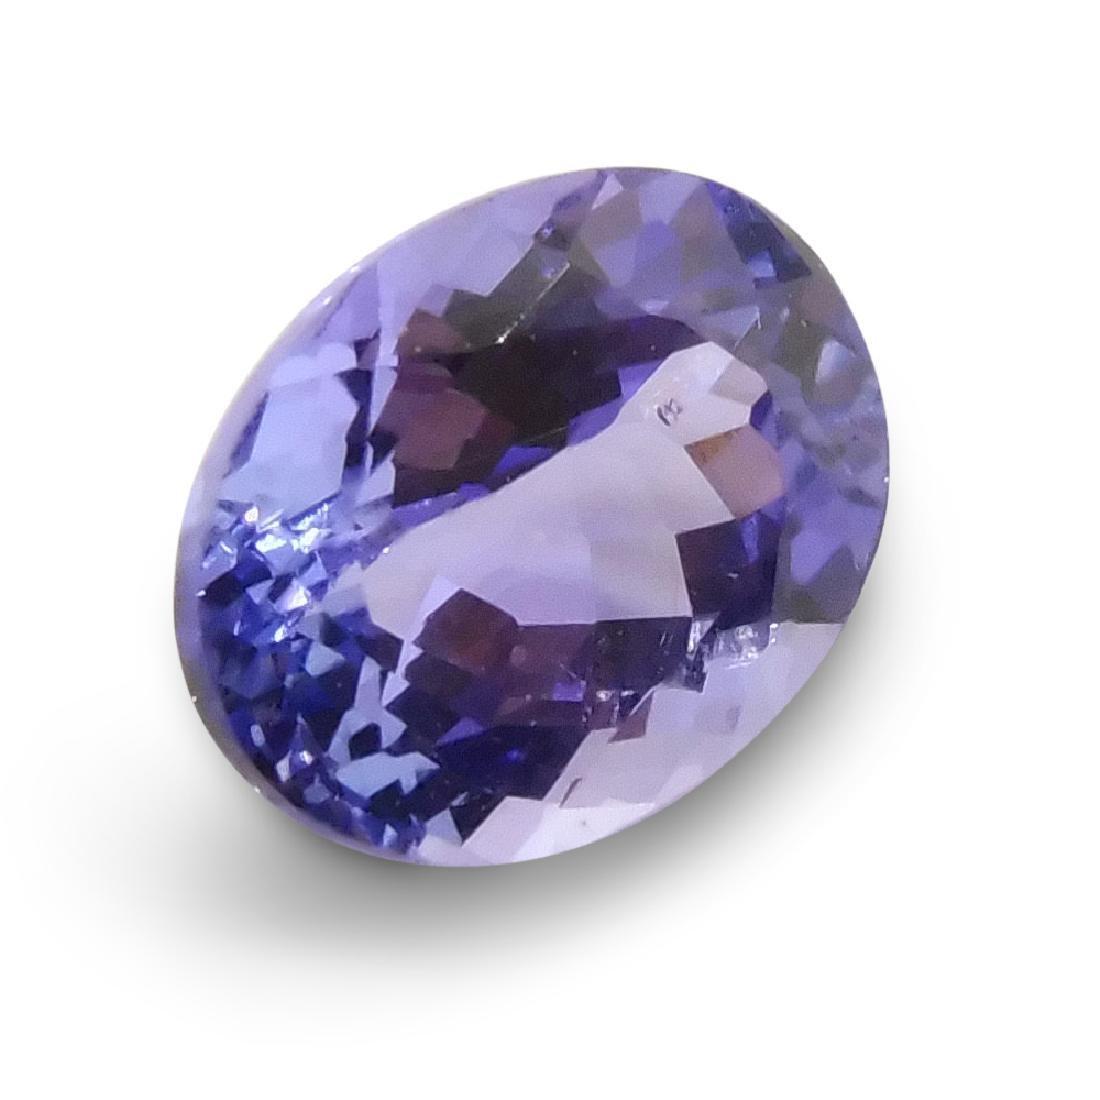 1.9 Carat Loose Oval IGI Certified Tanzanite - 3